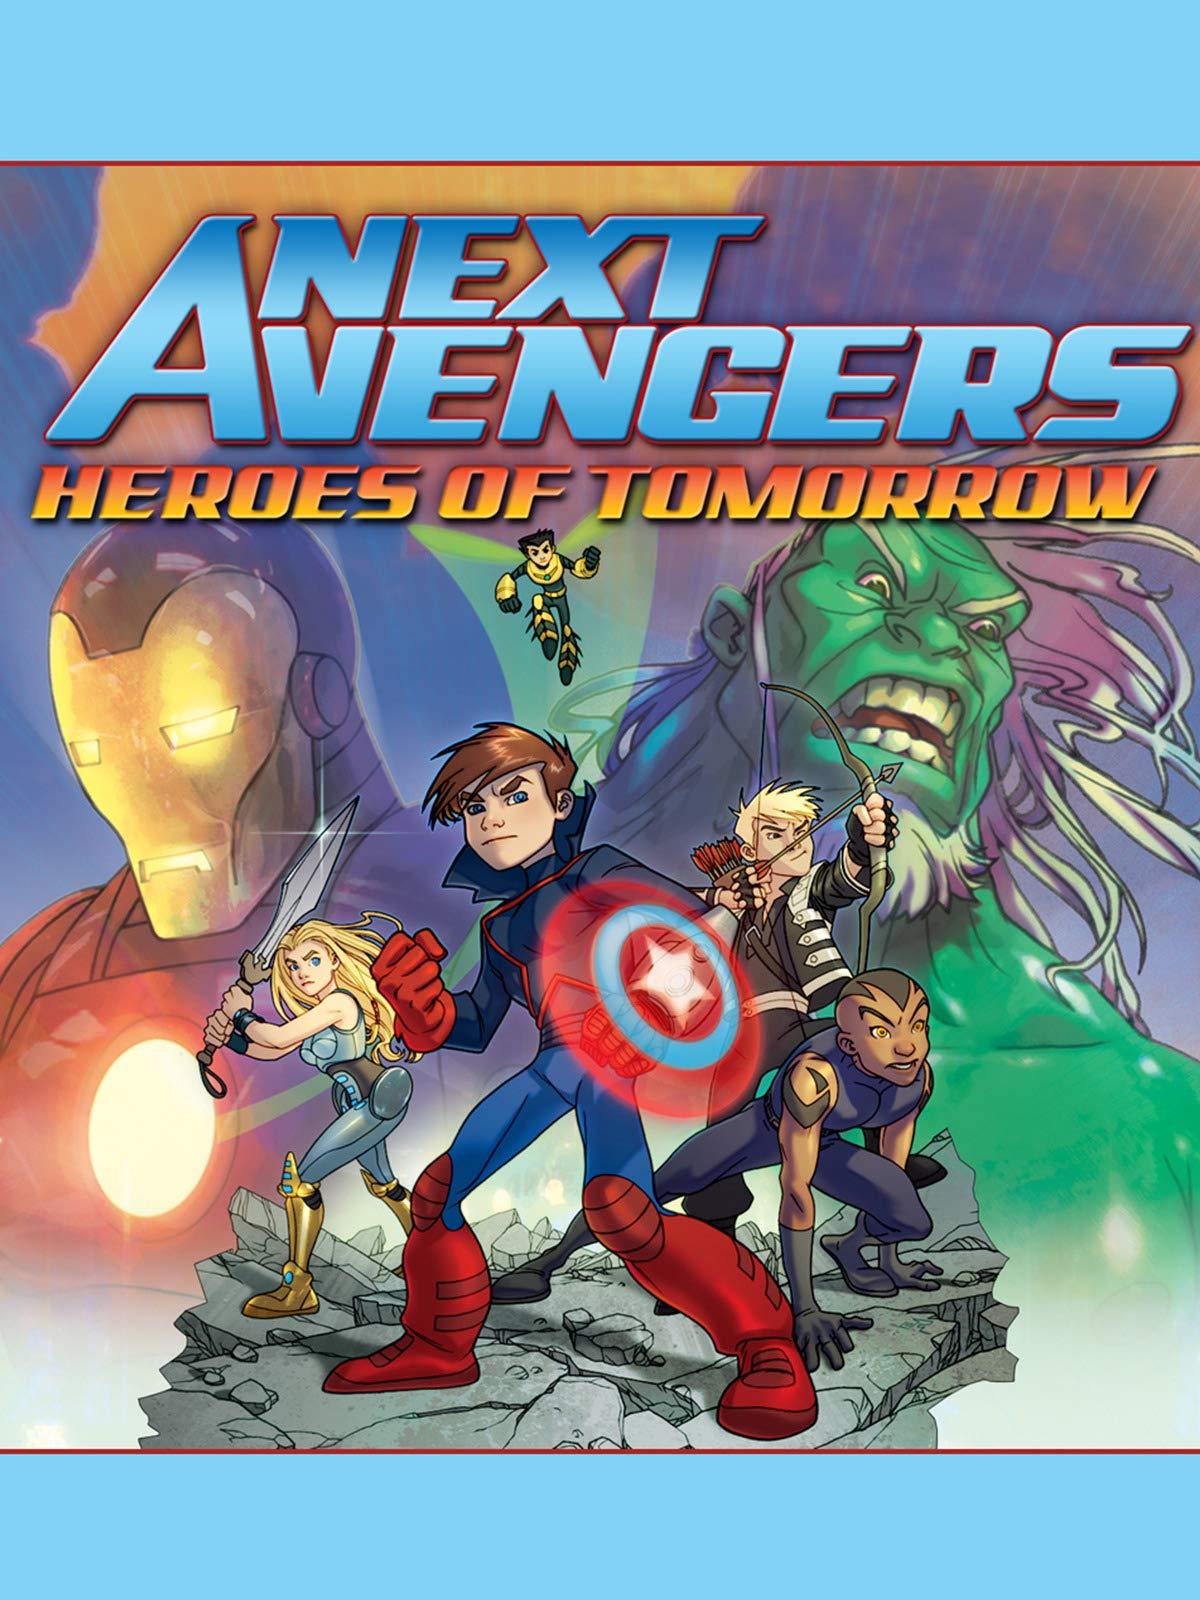 Next Avengers: Heroes of Tomorrow on Amazon Prime Video UK